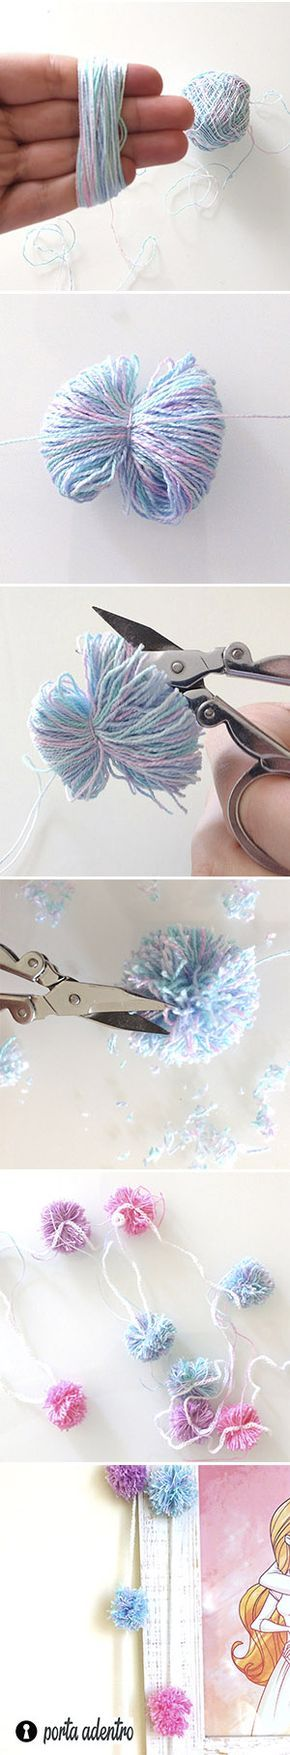 List Of Pinterest Ozdoby Do Pokoju Tumblr Diy Images Ozdoby Do